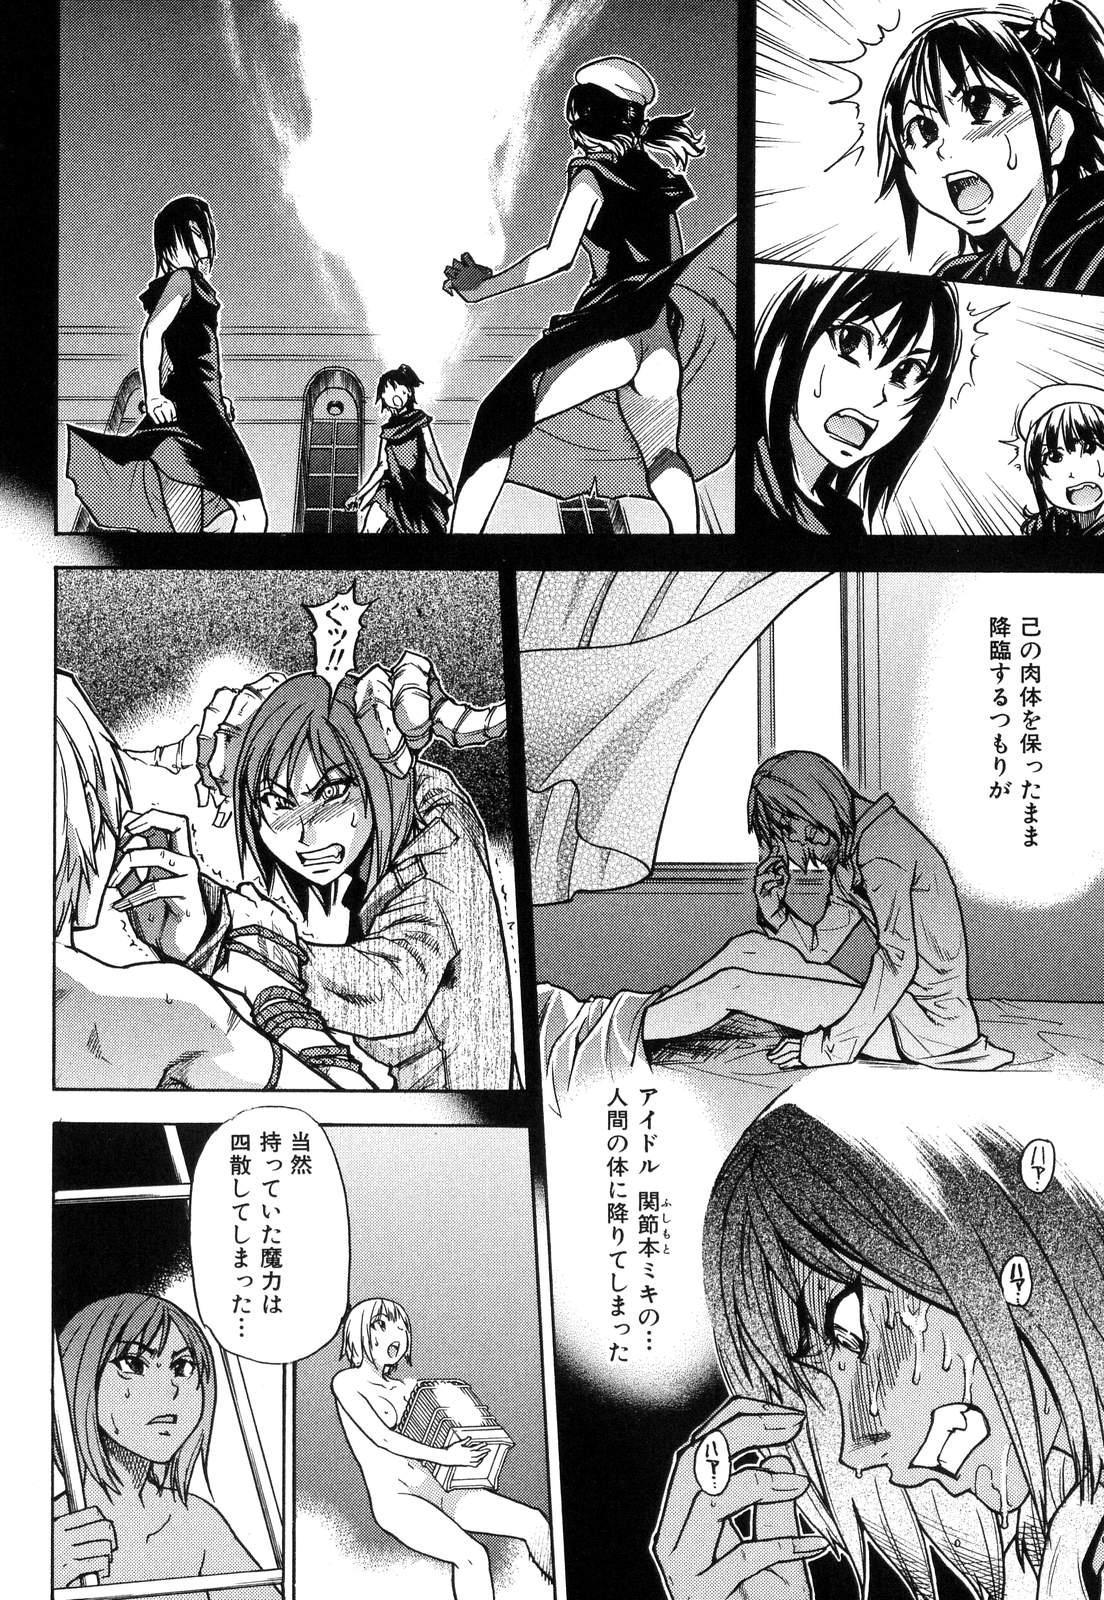 Shining Musume. 6. Rainbow Six 194